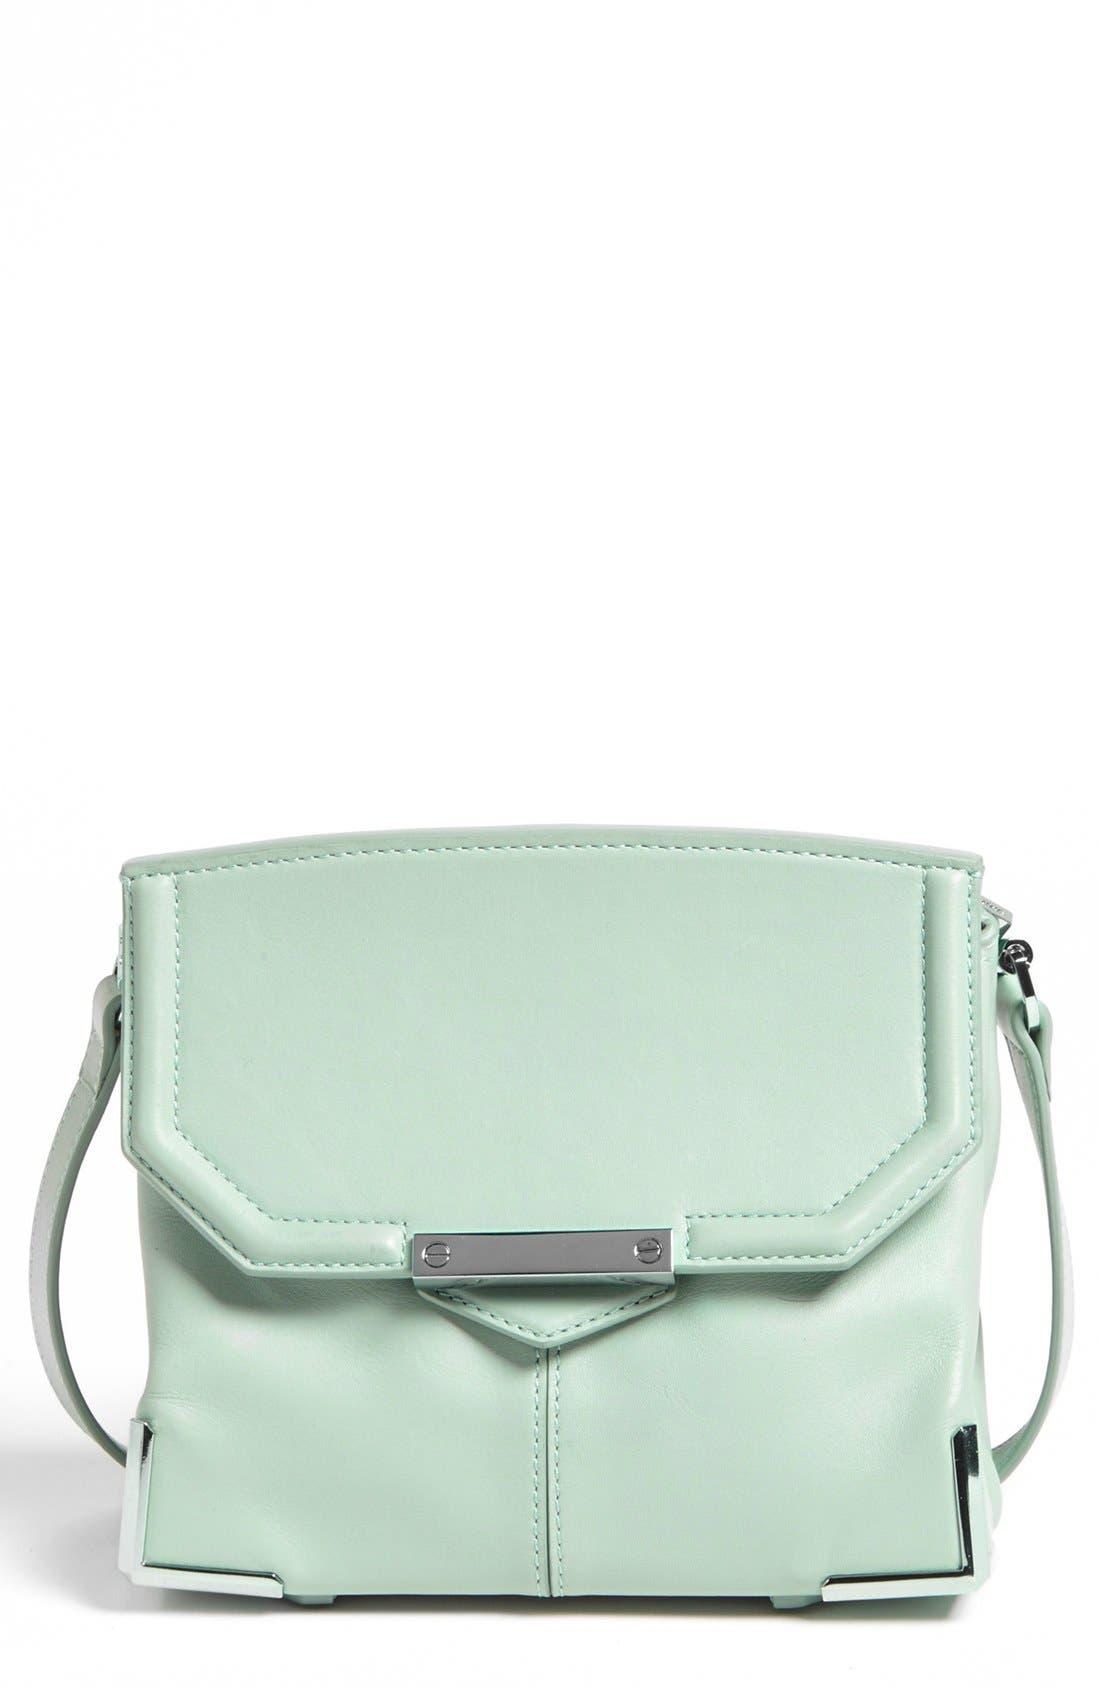 Alternate Image 1 Selected - Alexander Wang 'Marion Mini - Prisma' Leather Crossbody Bag